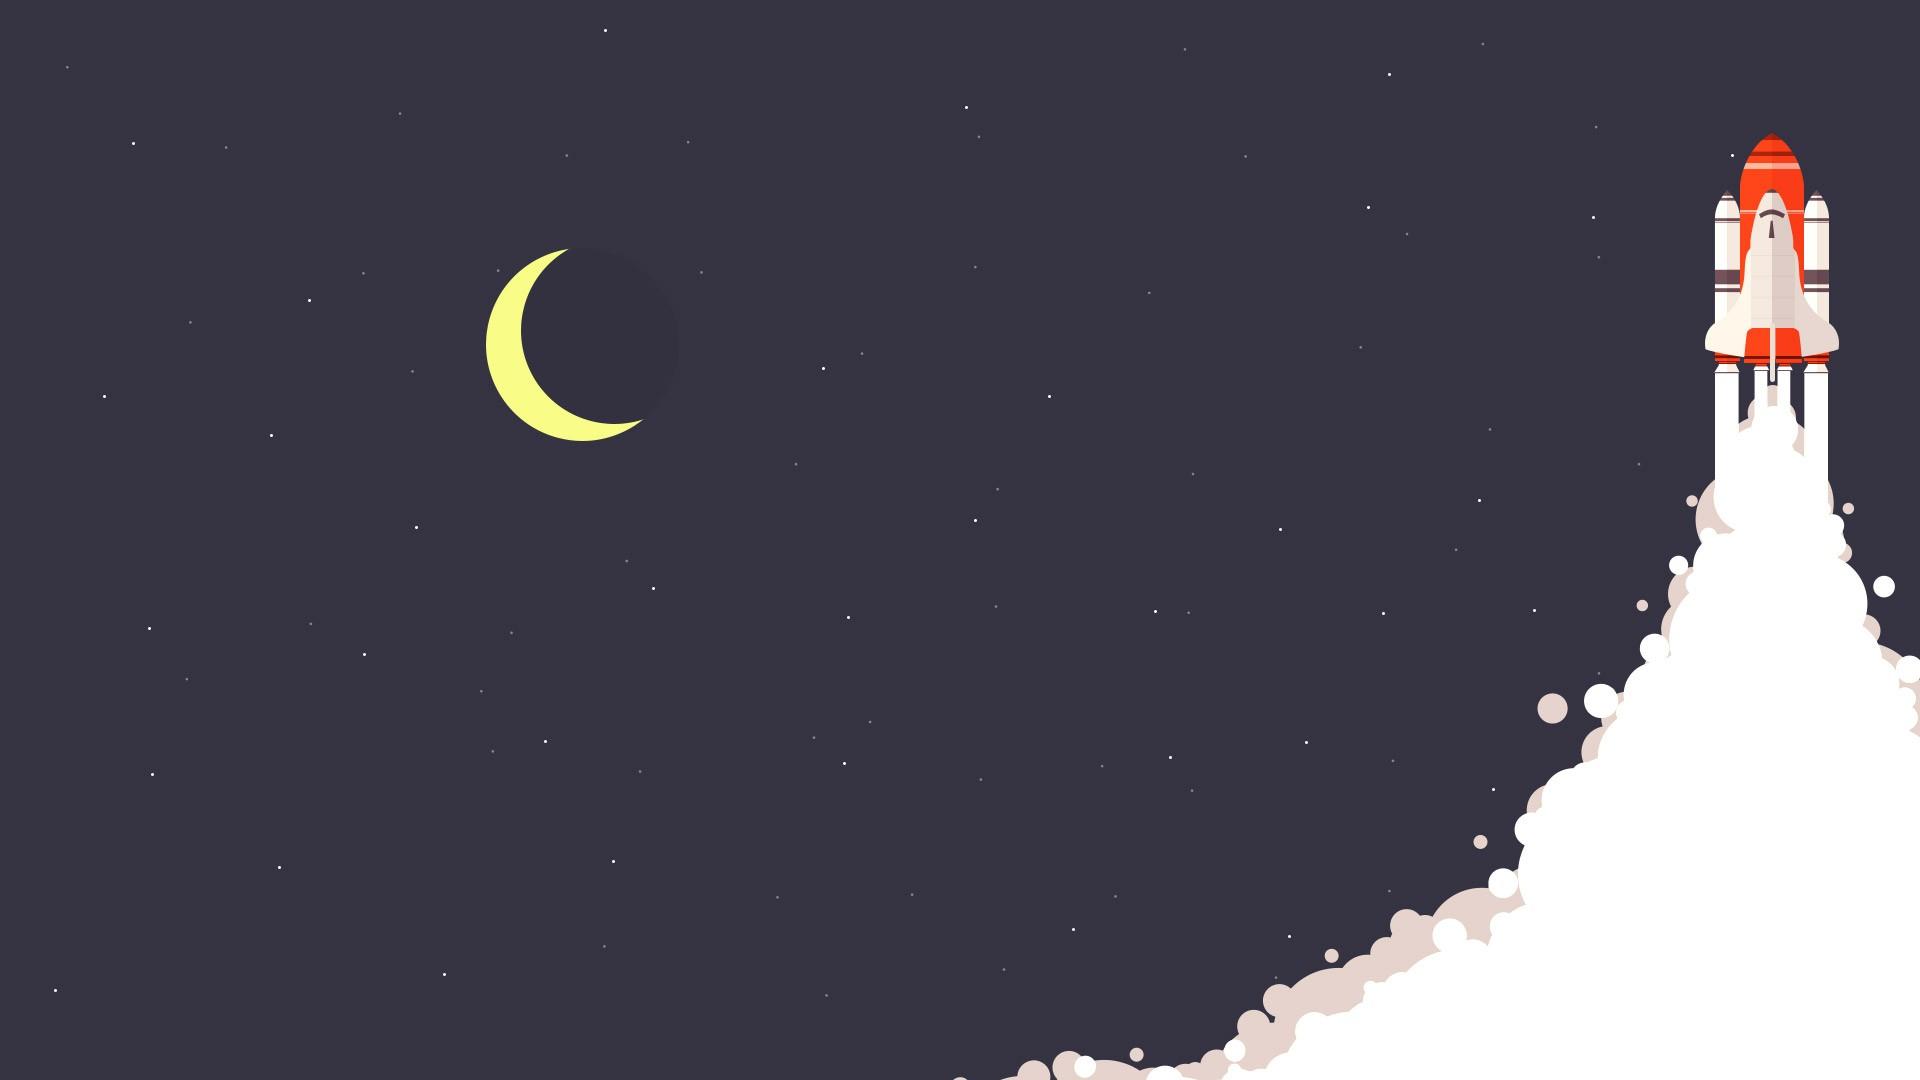 Wallpaper Illustration Night Space Minimalism Stars Moon Rocket Universe Astronomical Object Crescent 1920x1080 Microcosmos 50258 Hd Wallpapers Wallhere